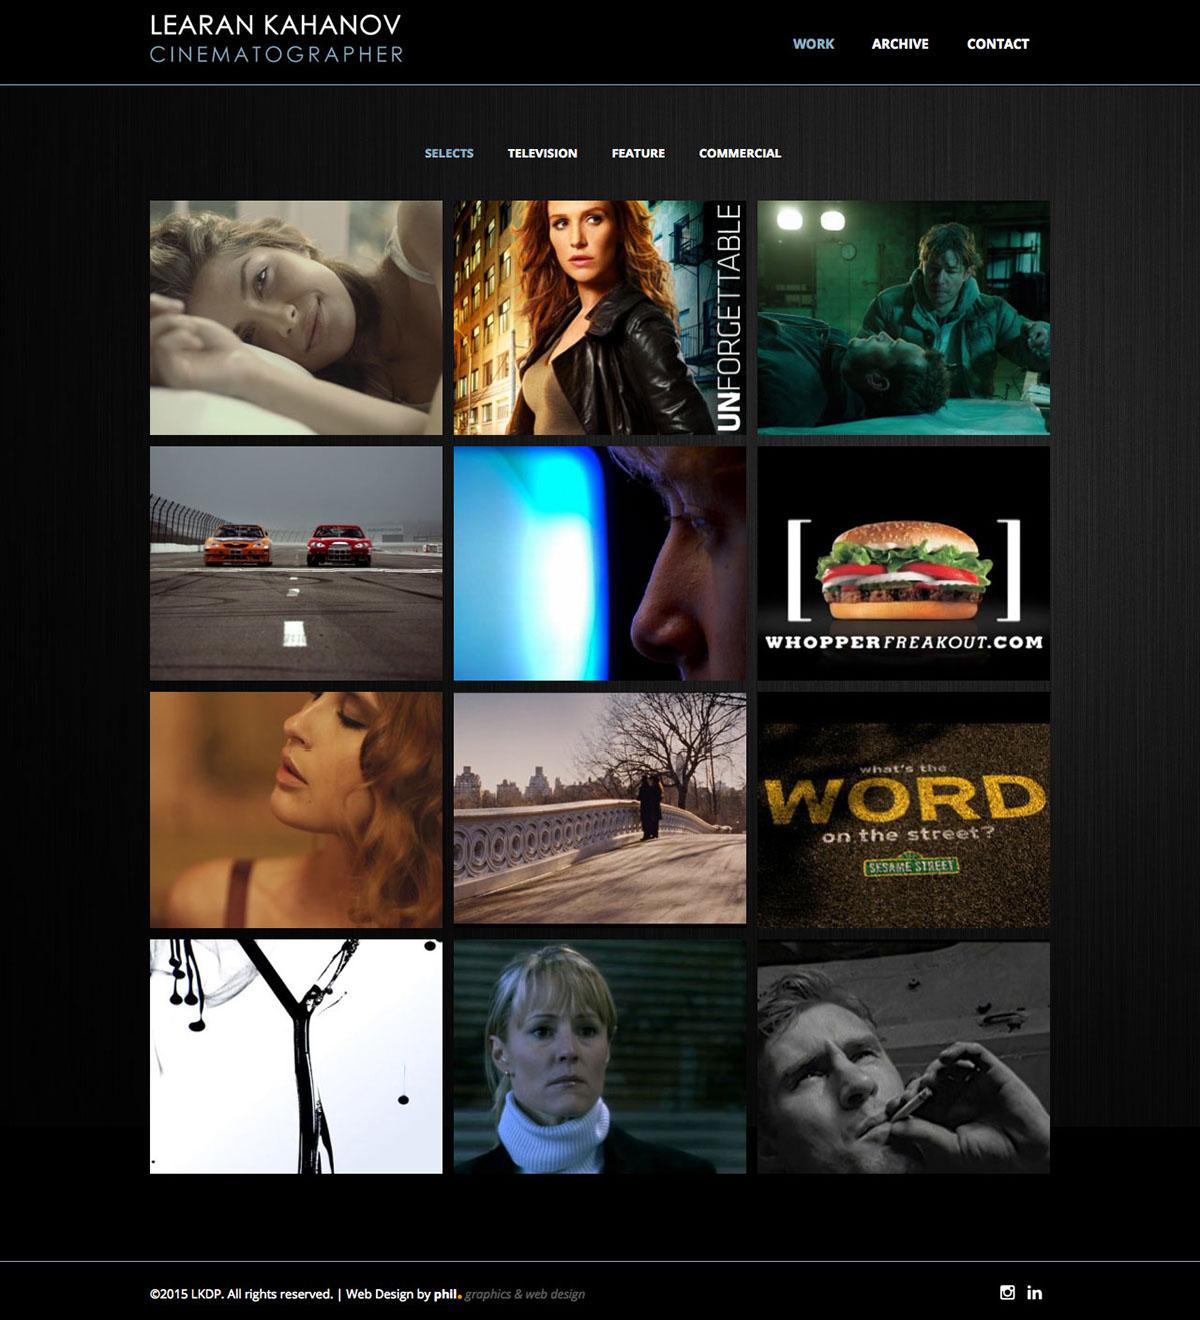 Learan Kahanov - Cinematographer Website Design